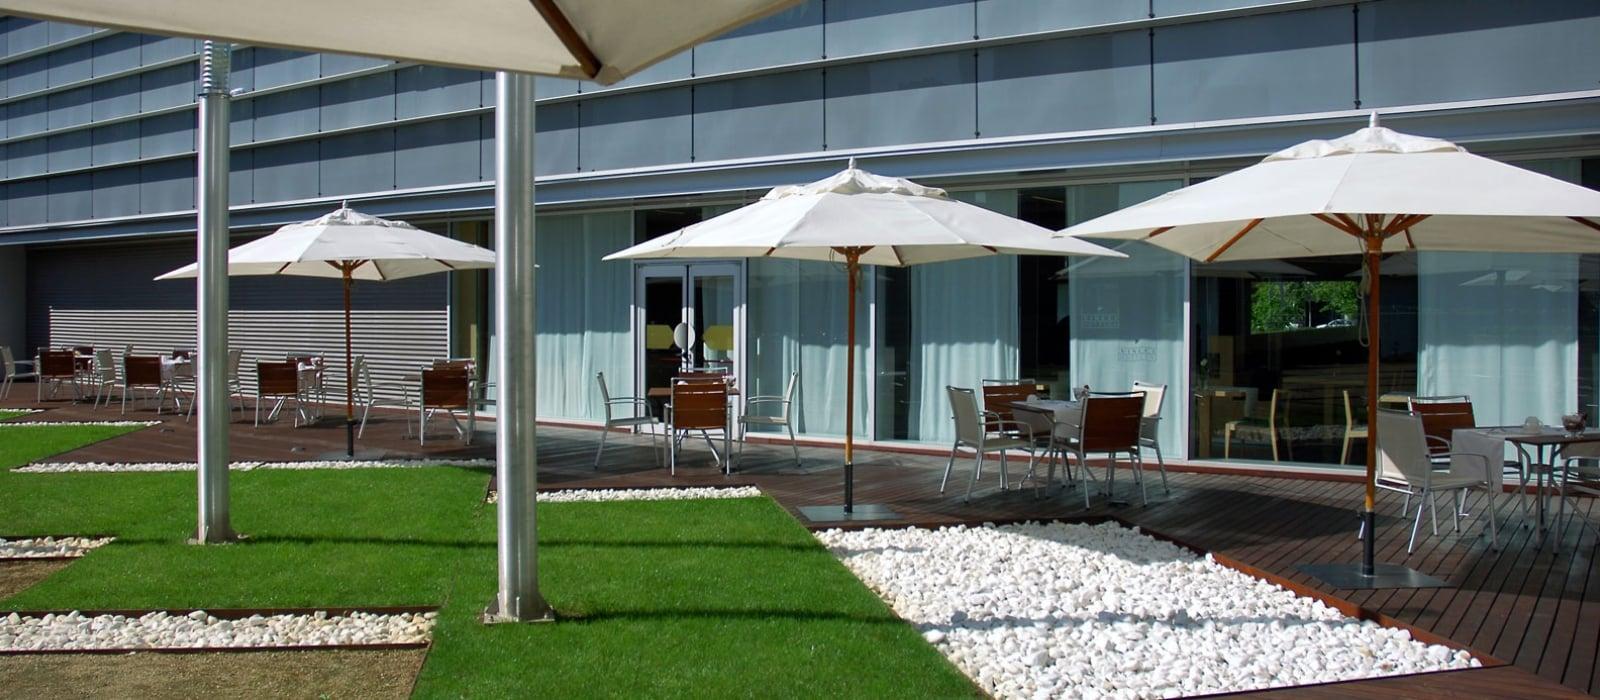 Services Hotel Barcelona Marítimo - Vincci Hotels - Japanese Garden